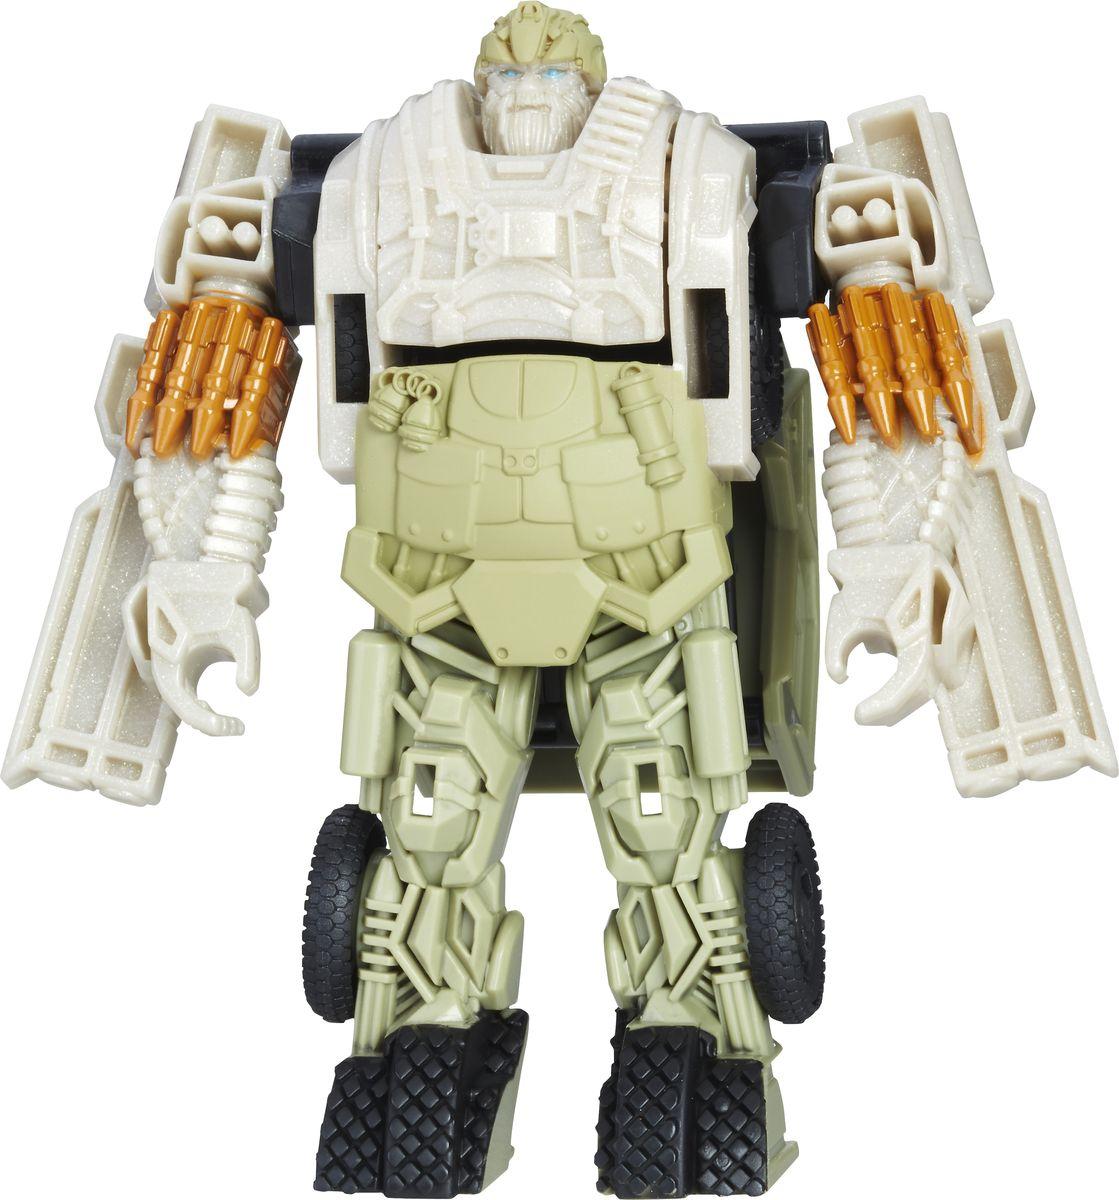 Transformers Трансформер Turbo Changer Autobot Hound - Фигурки